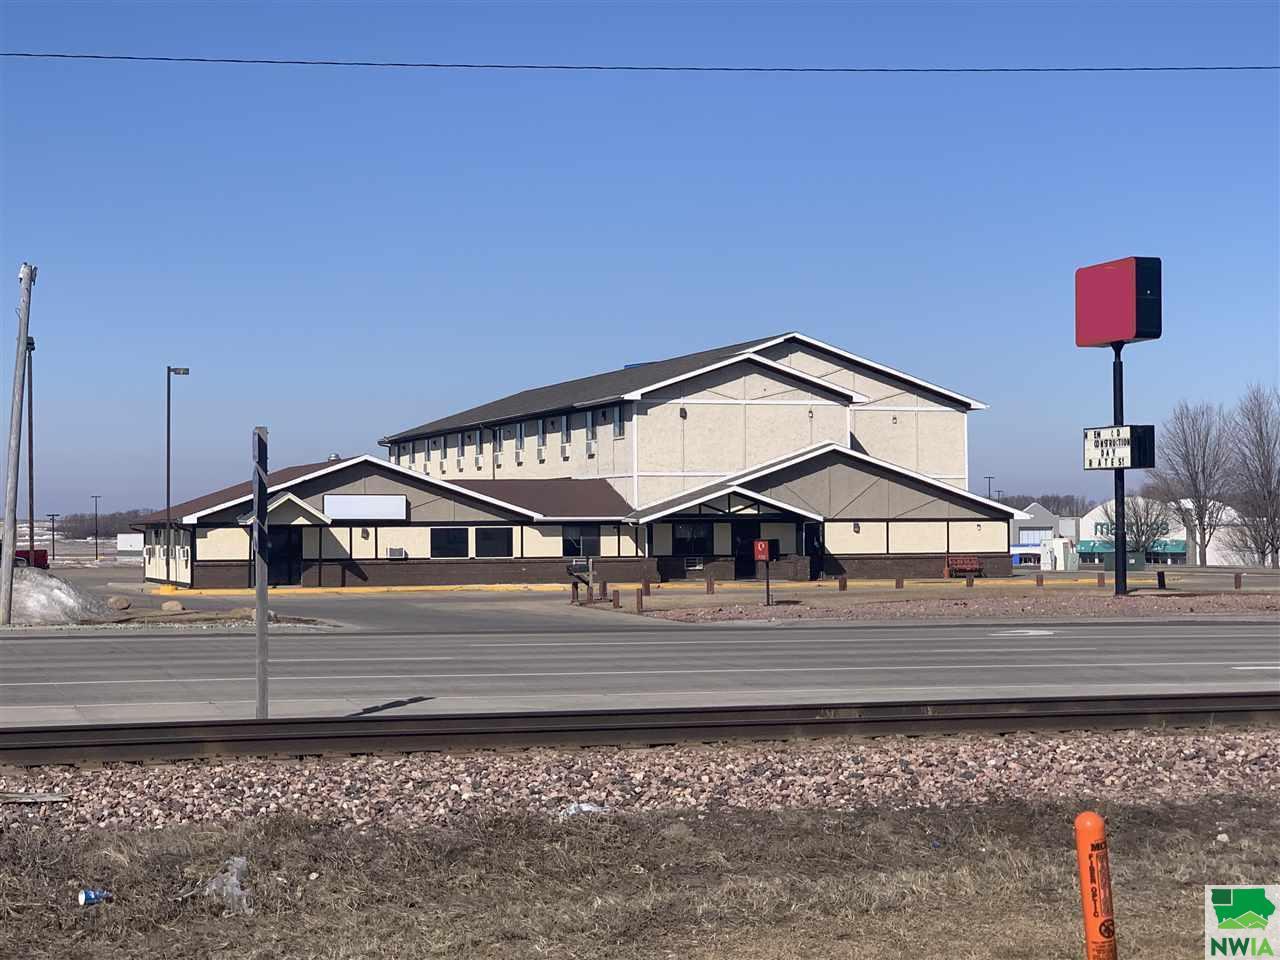 1201 Hawkeye Ave SW, LeMars, Iowa 51031